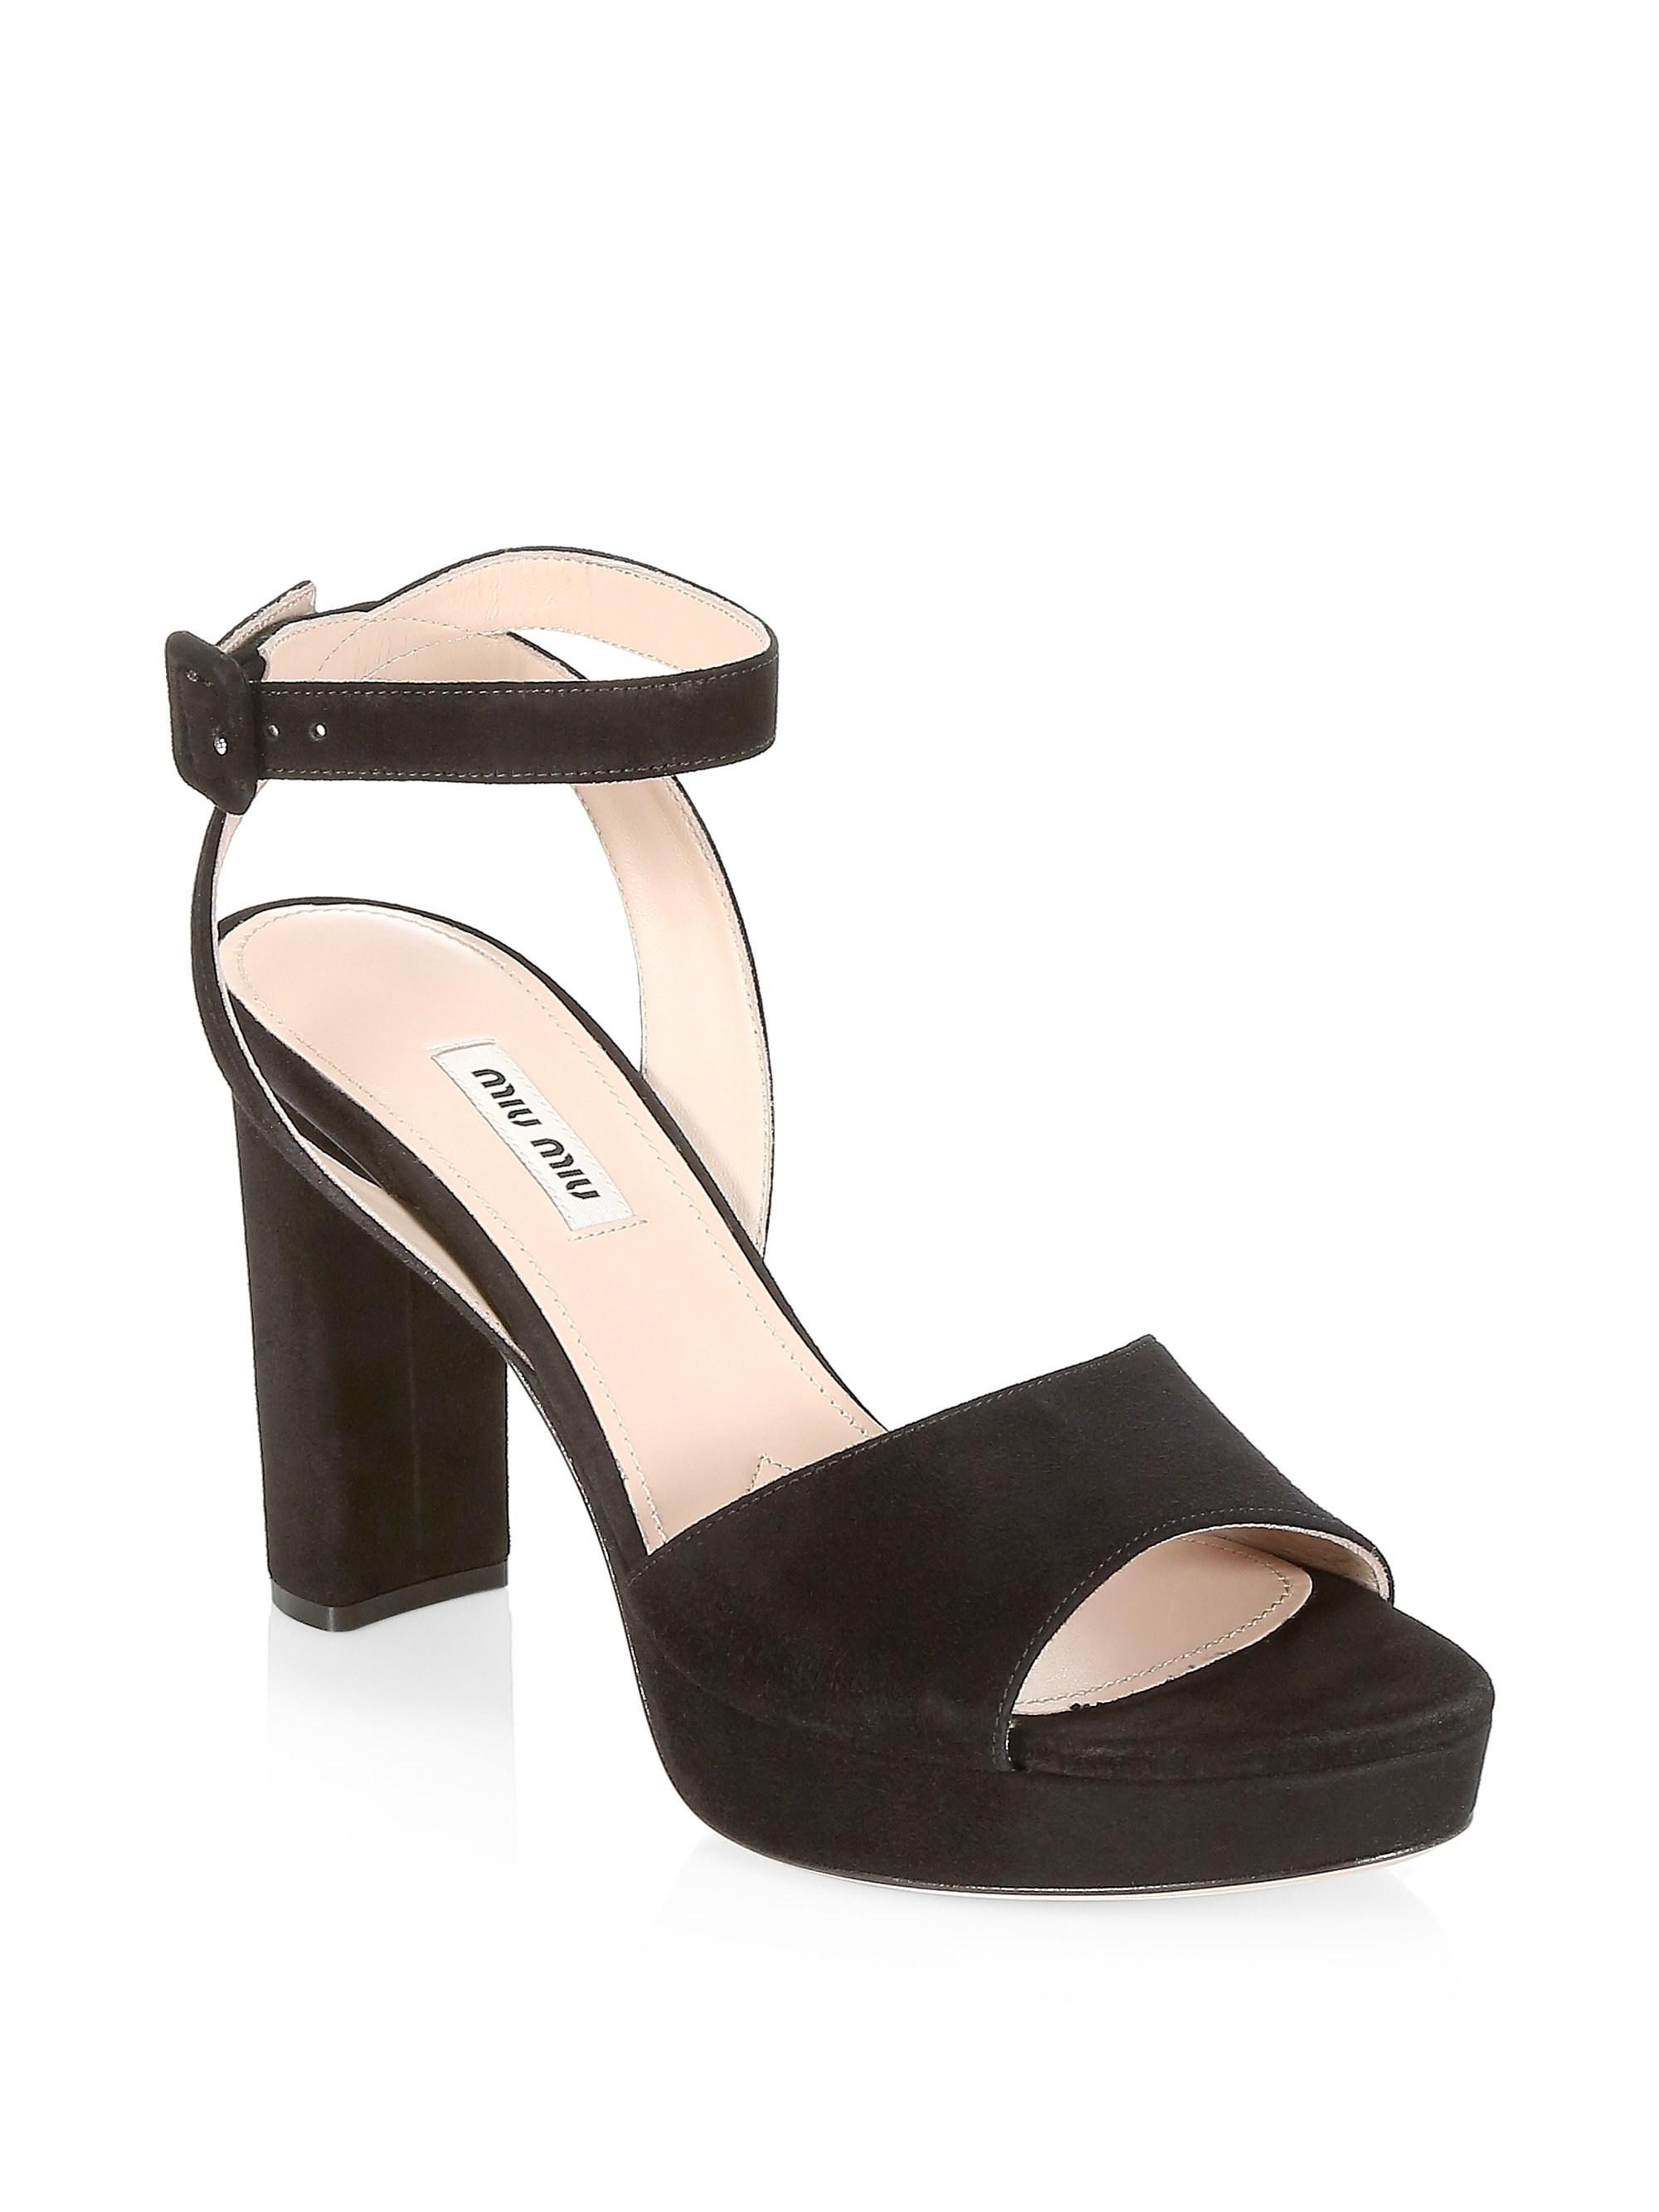 8f324ea1ea5 Miu Miu Suede Block Heel Platform Sandals in Black - Lyst